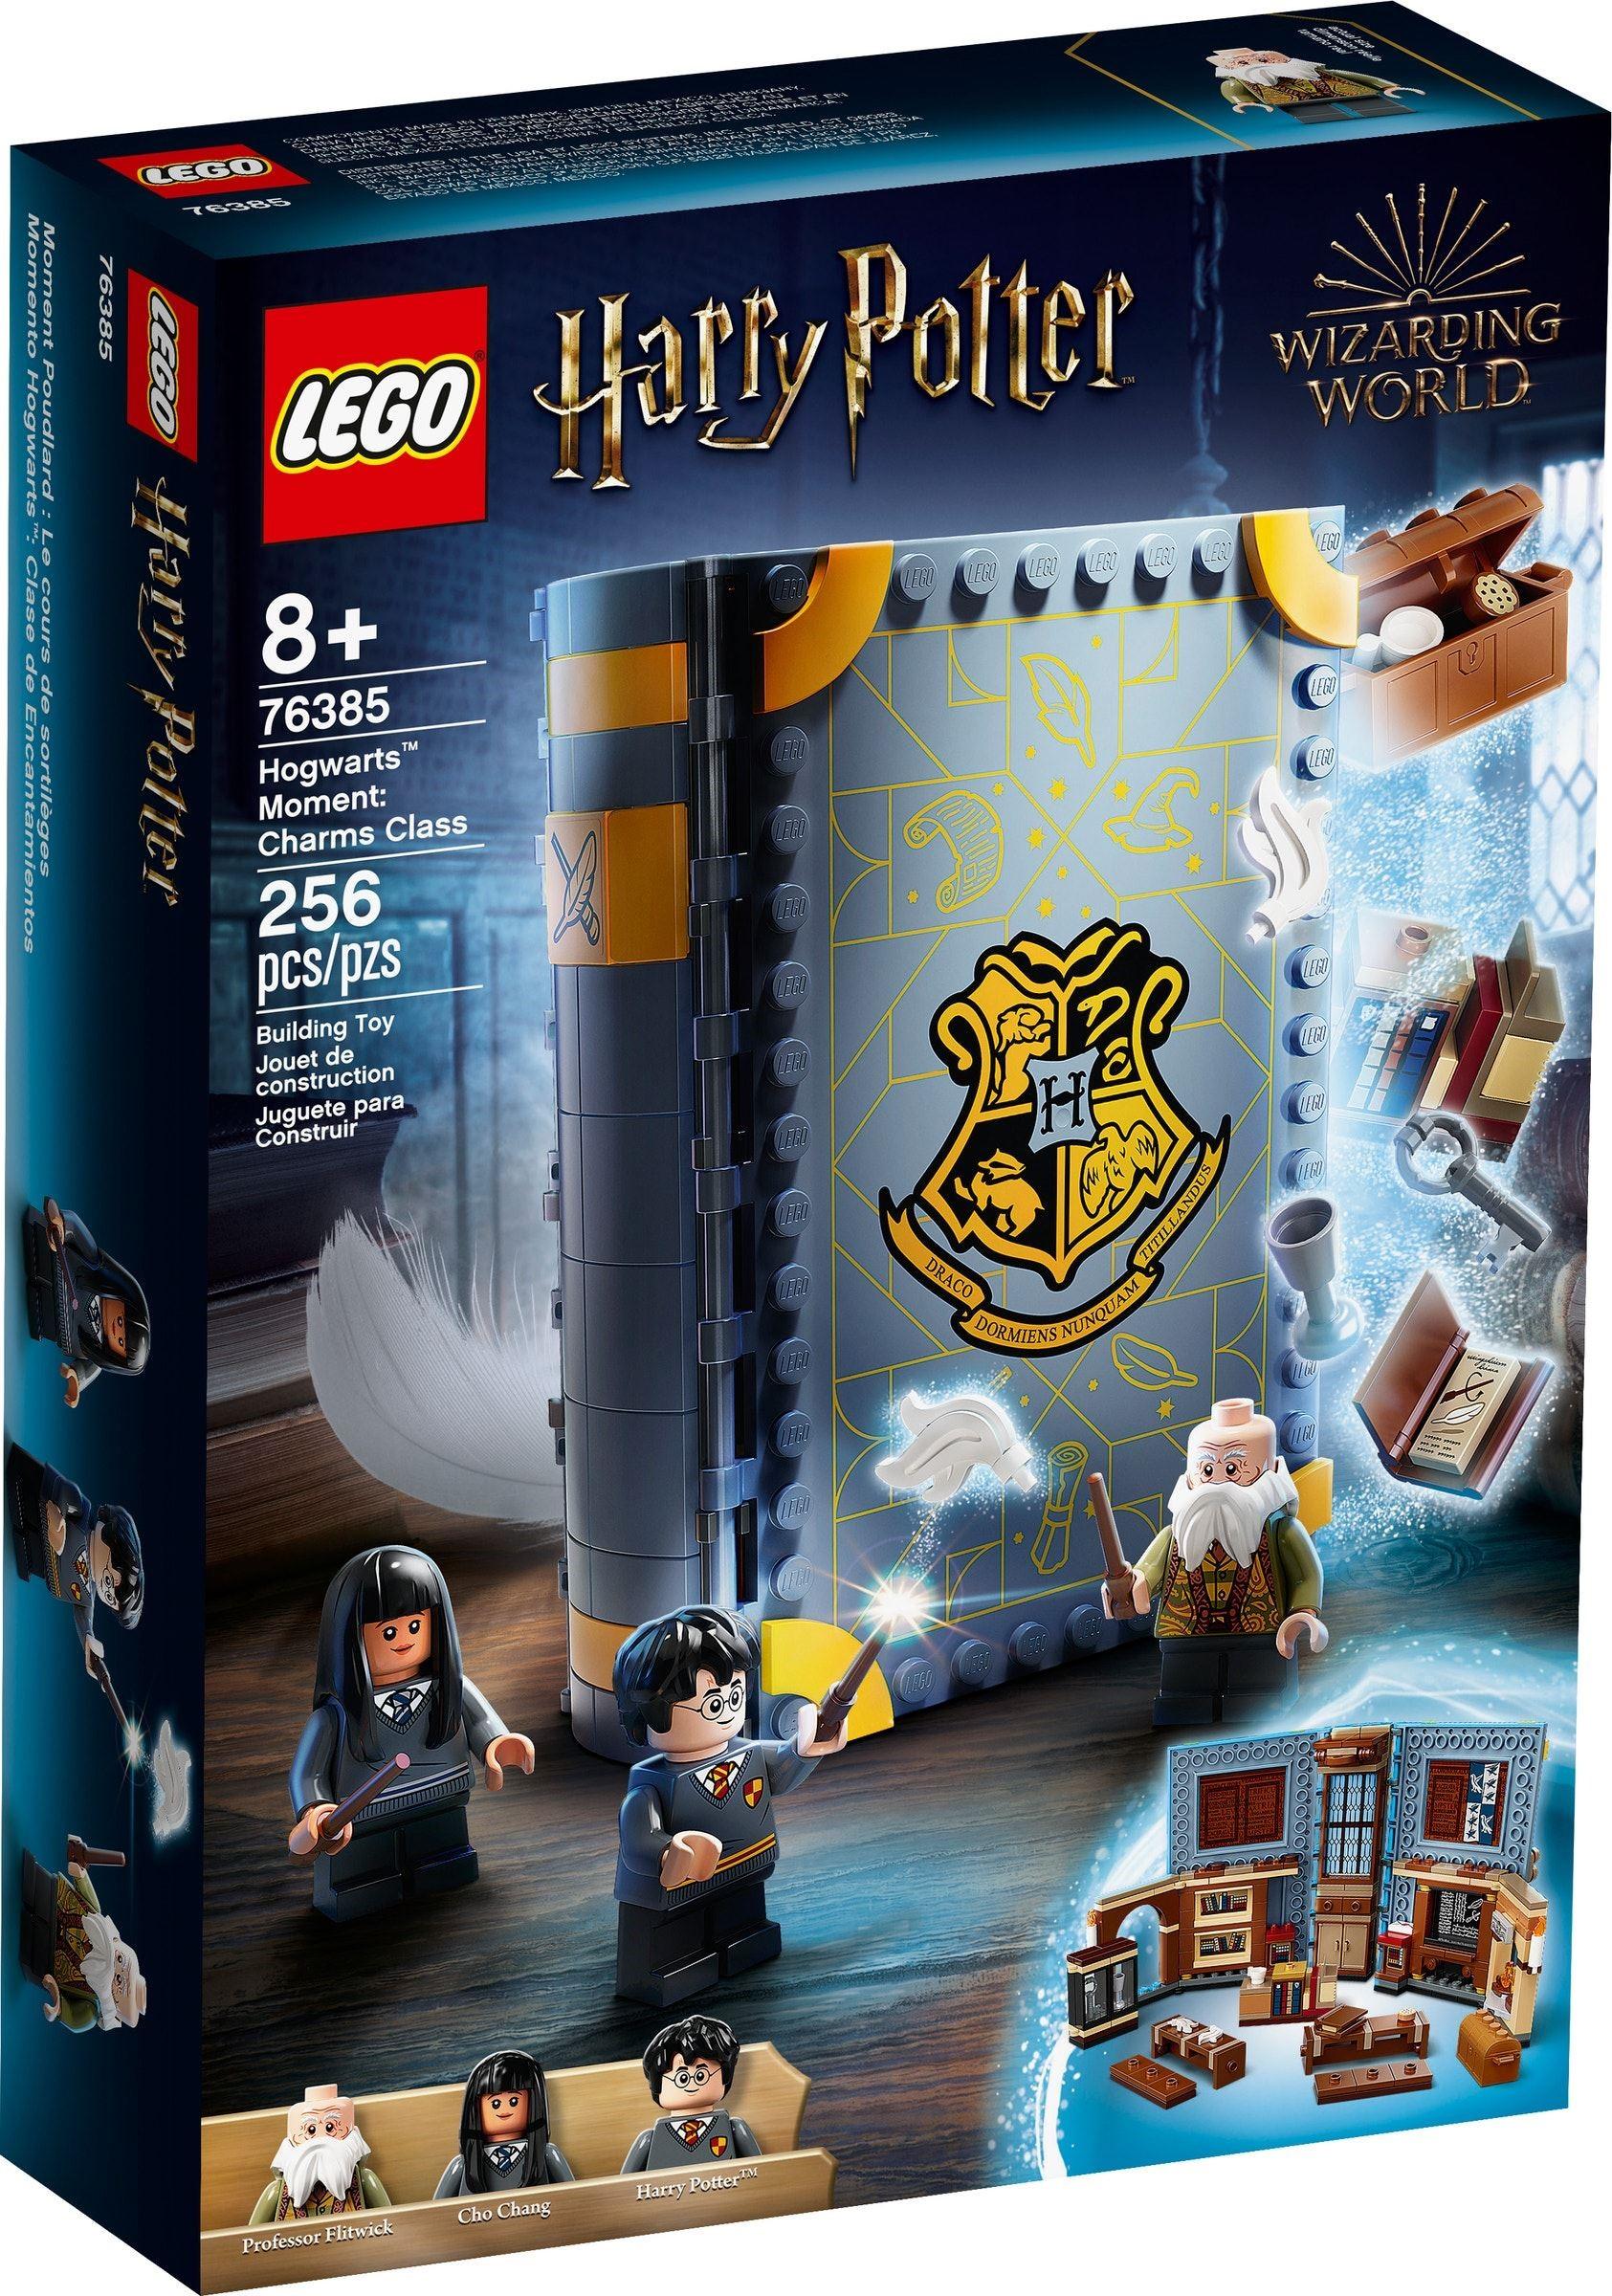 76385 Hogwarts Moment: Charms Class